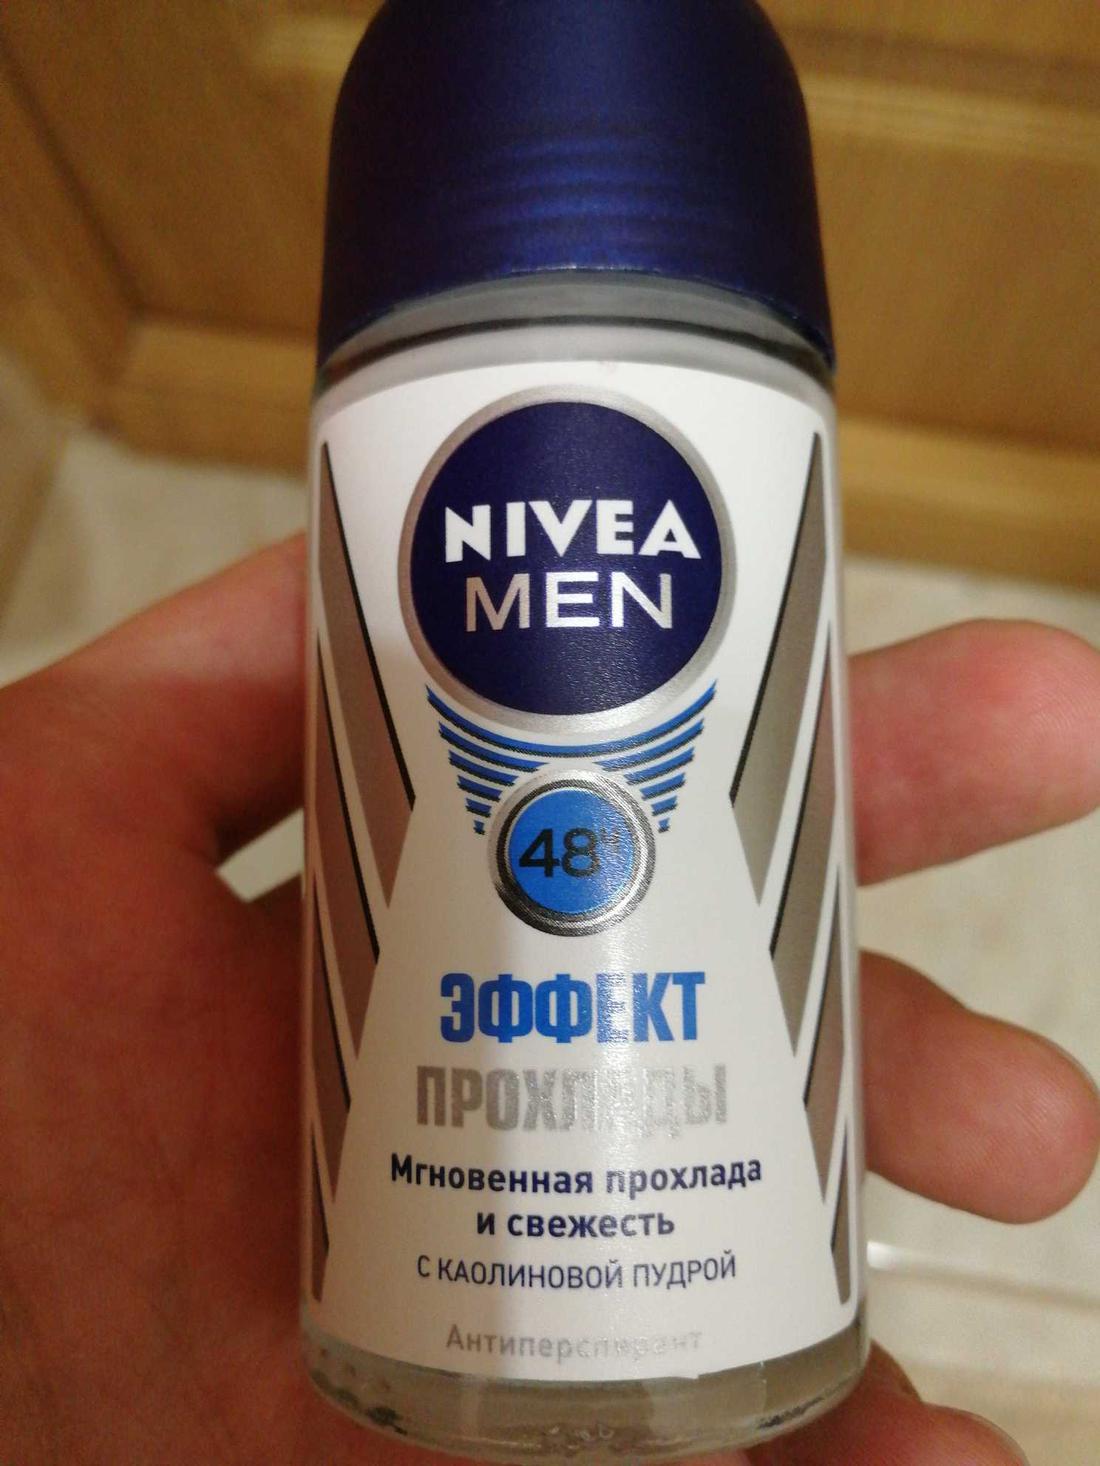 Nivea men, эффект прохлады